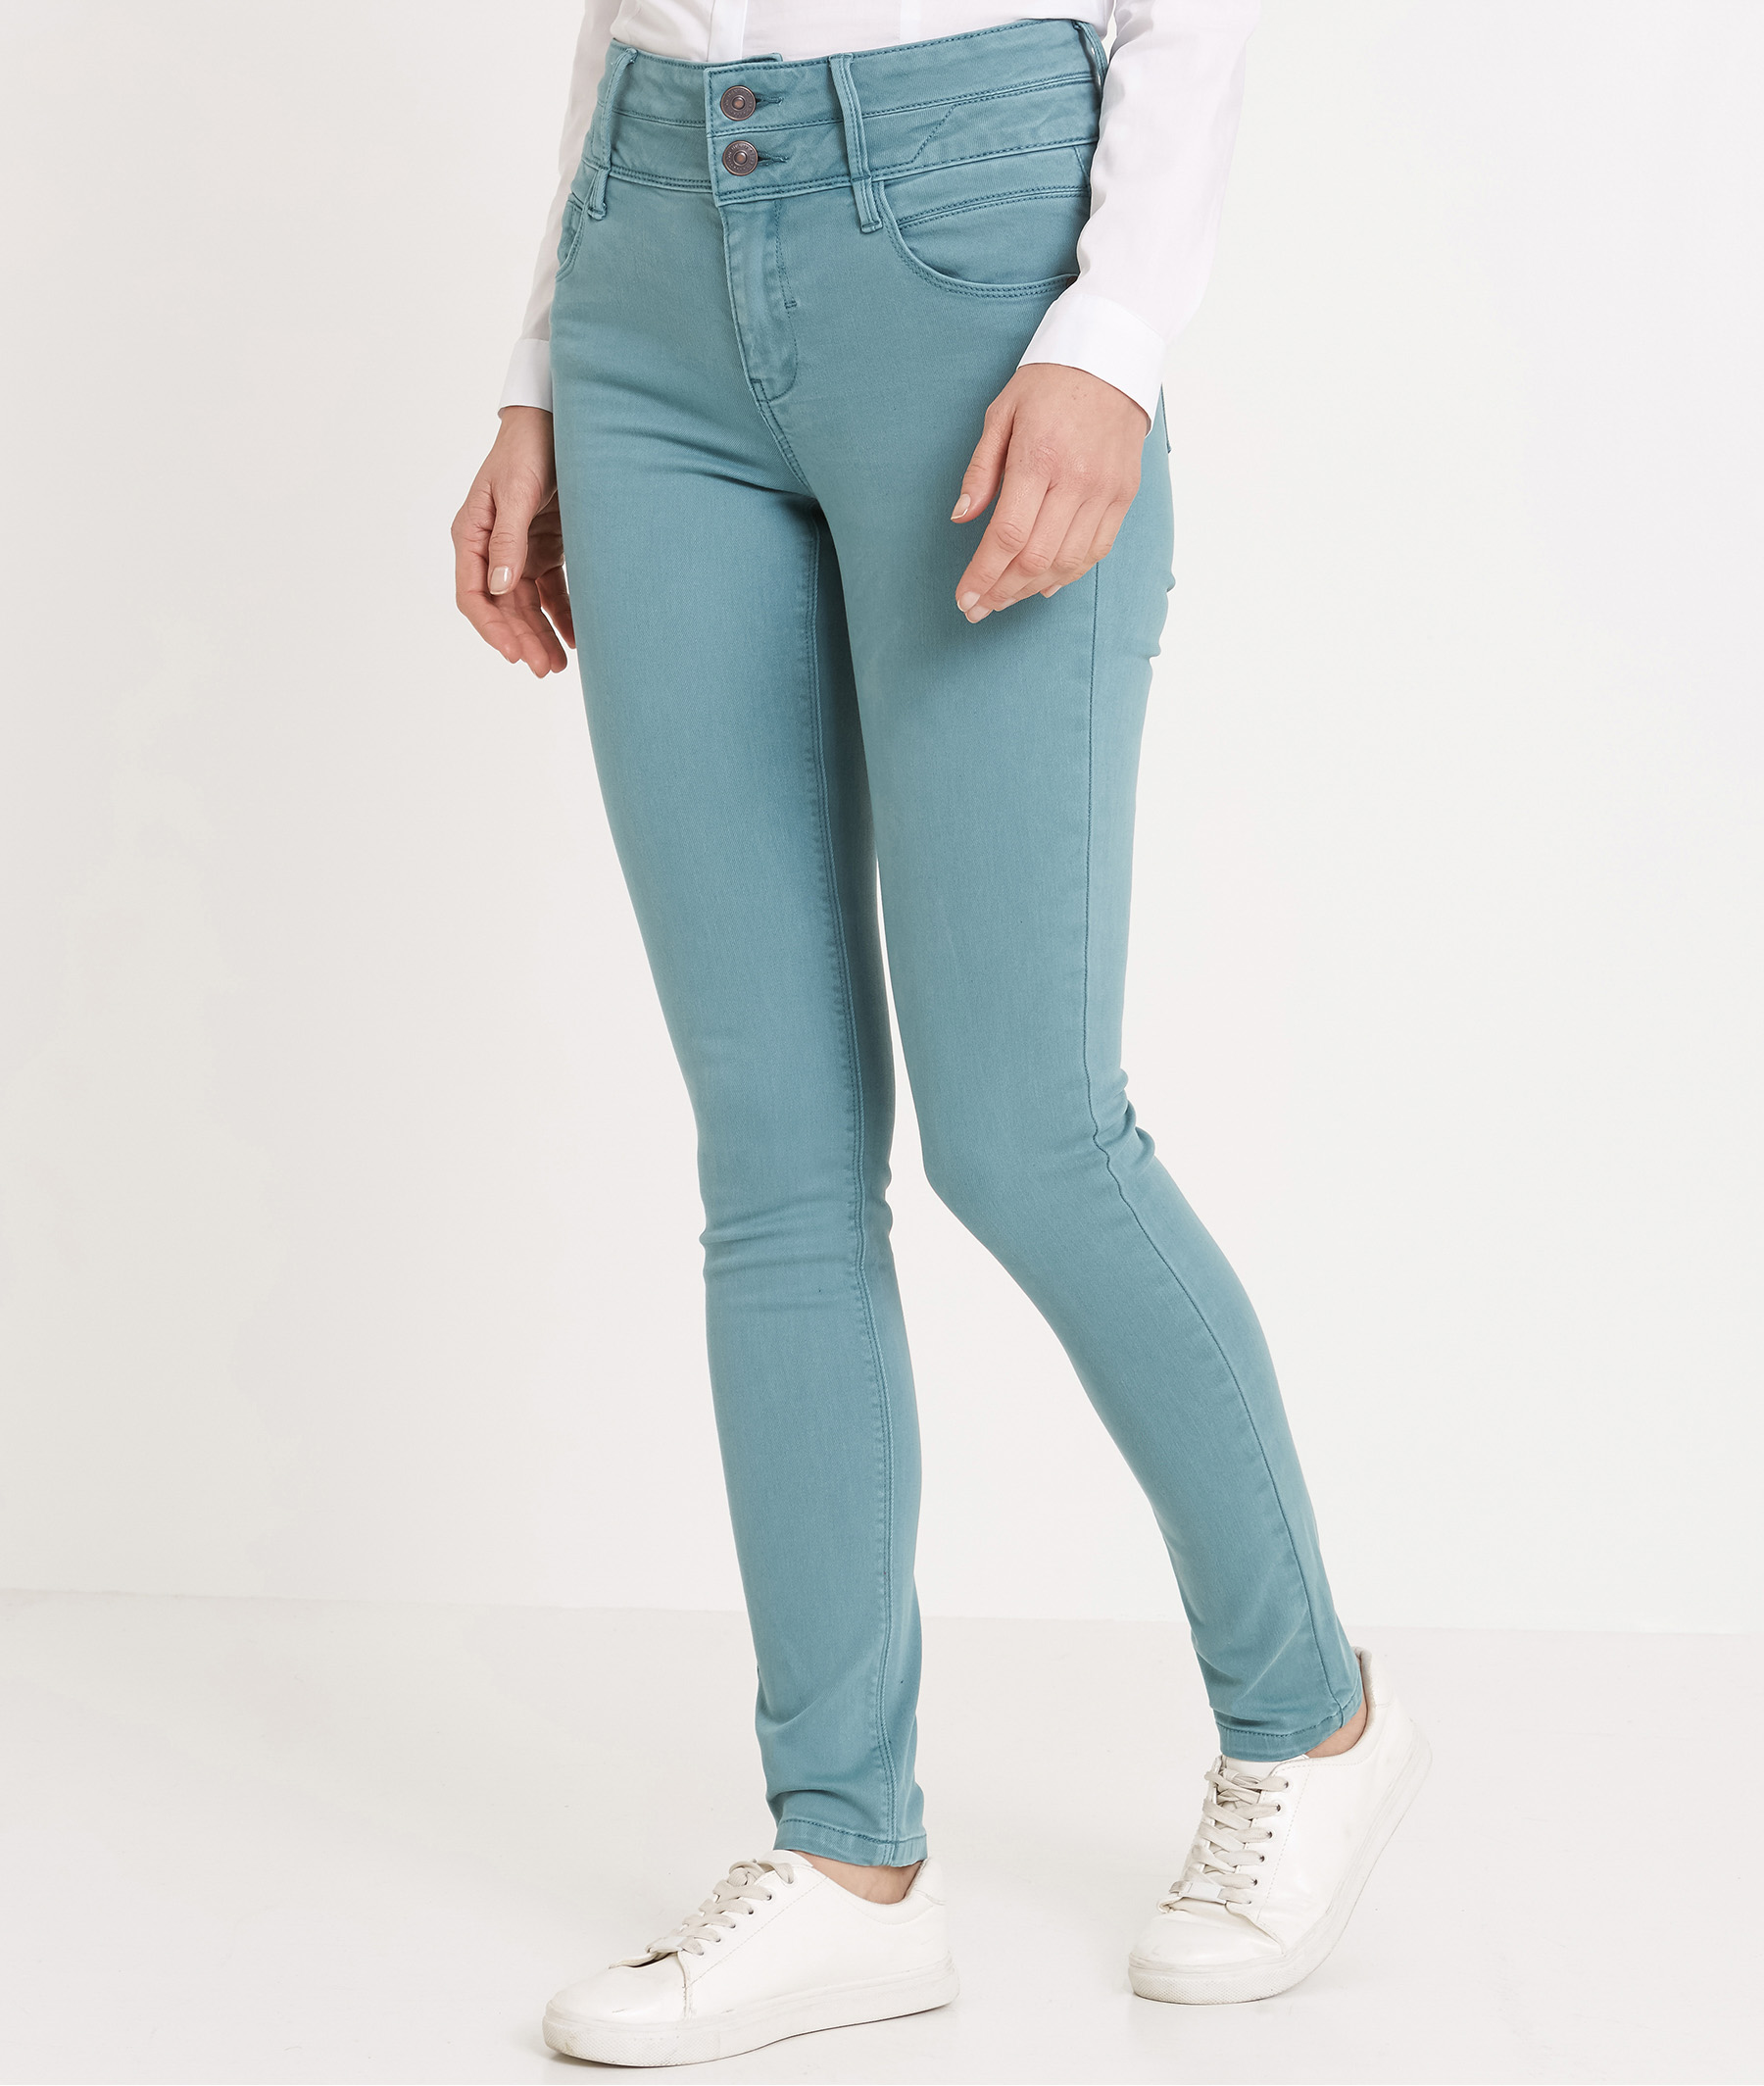 Pantalon femme slim taille haute BLEU